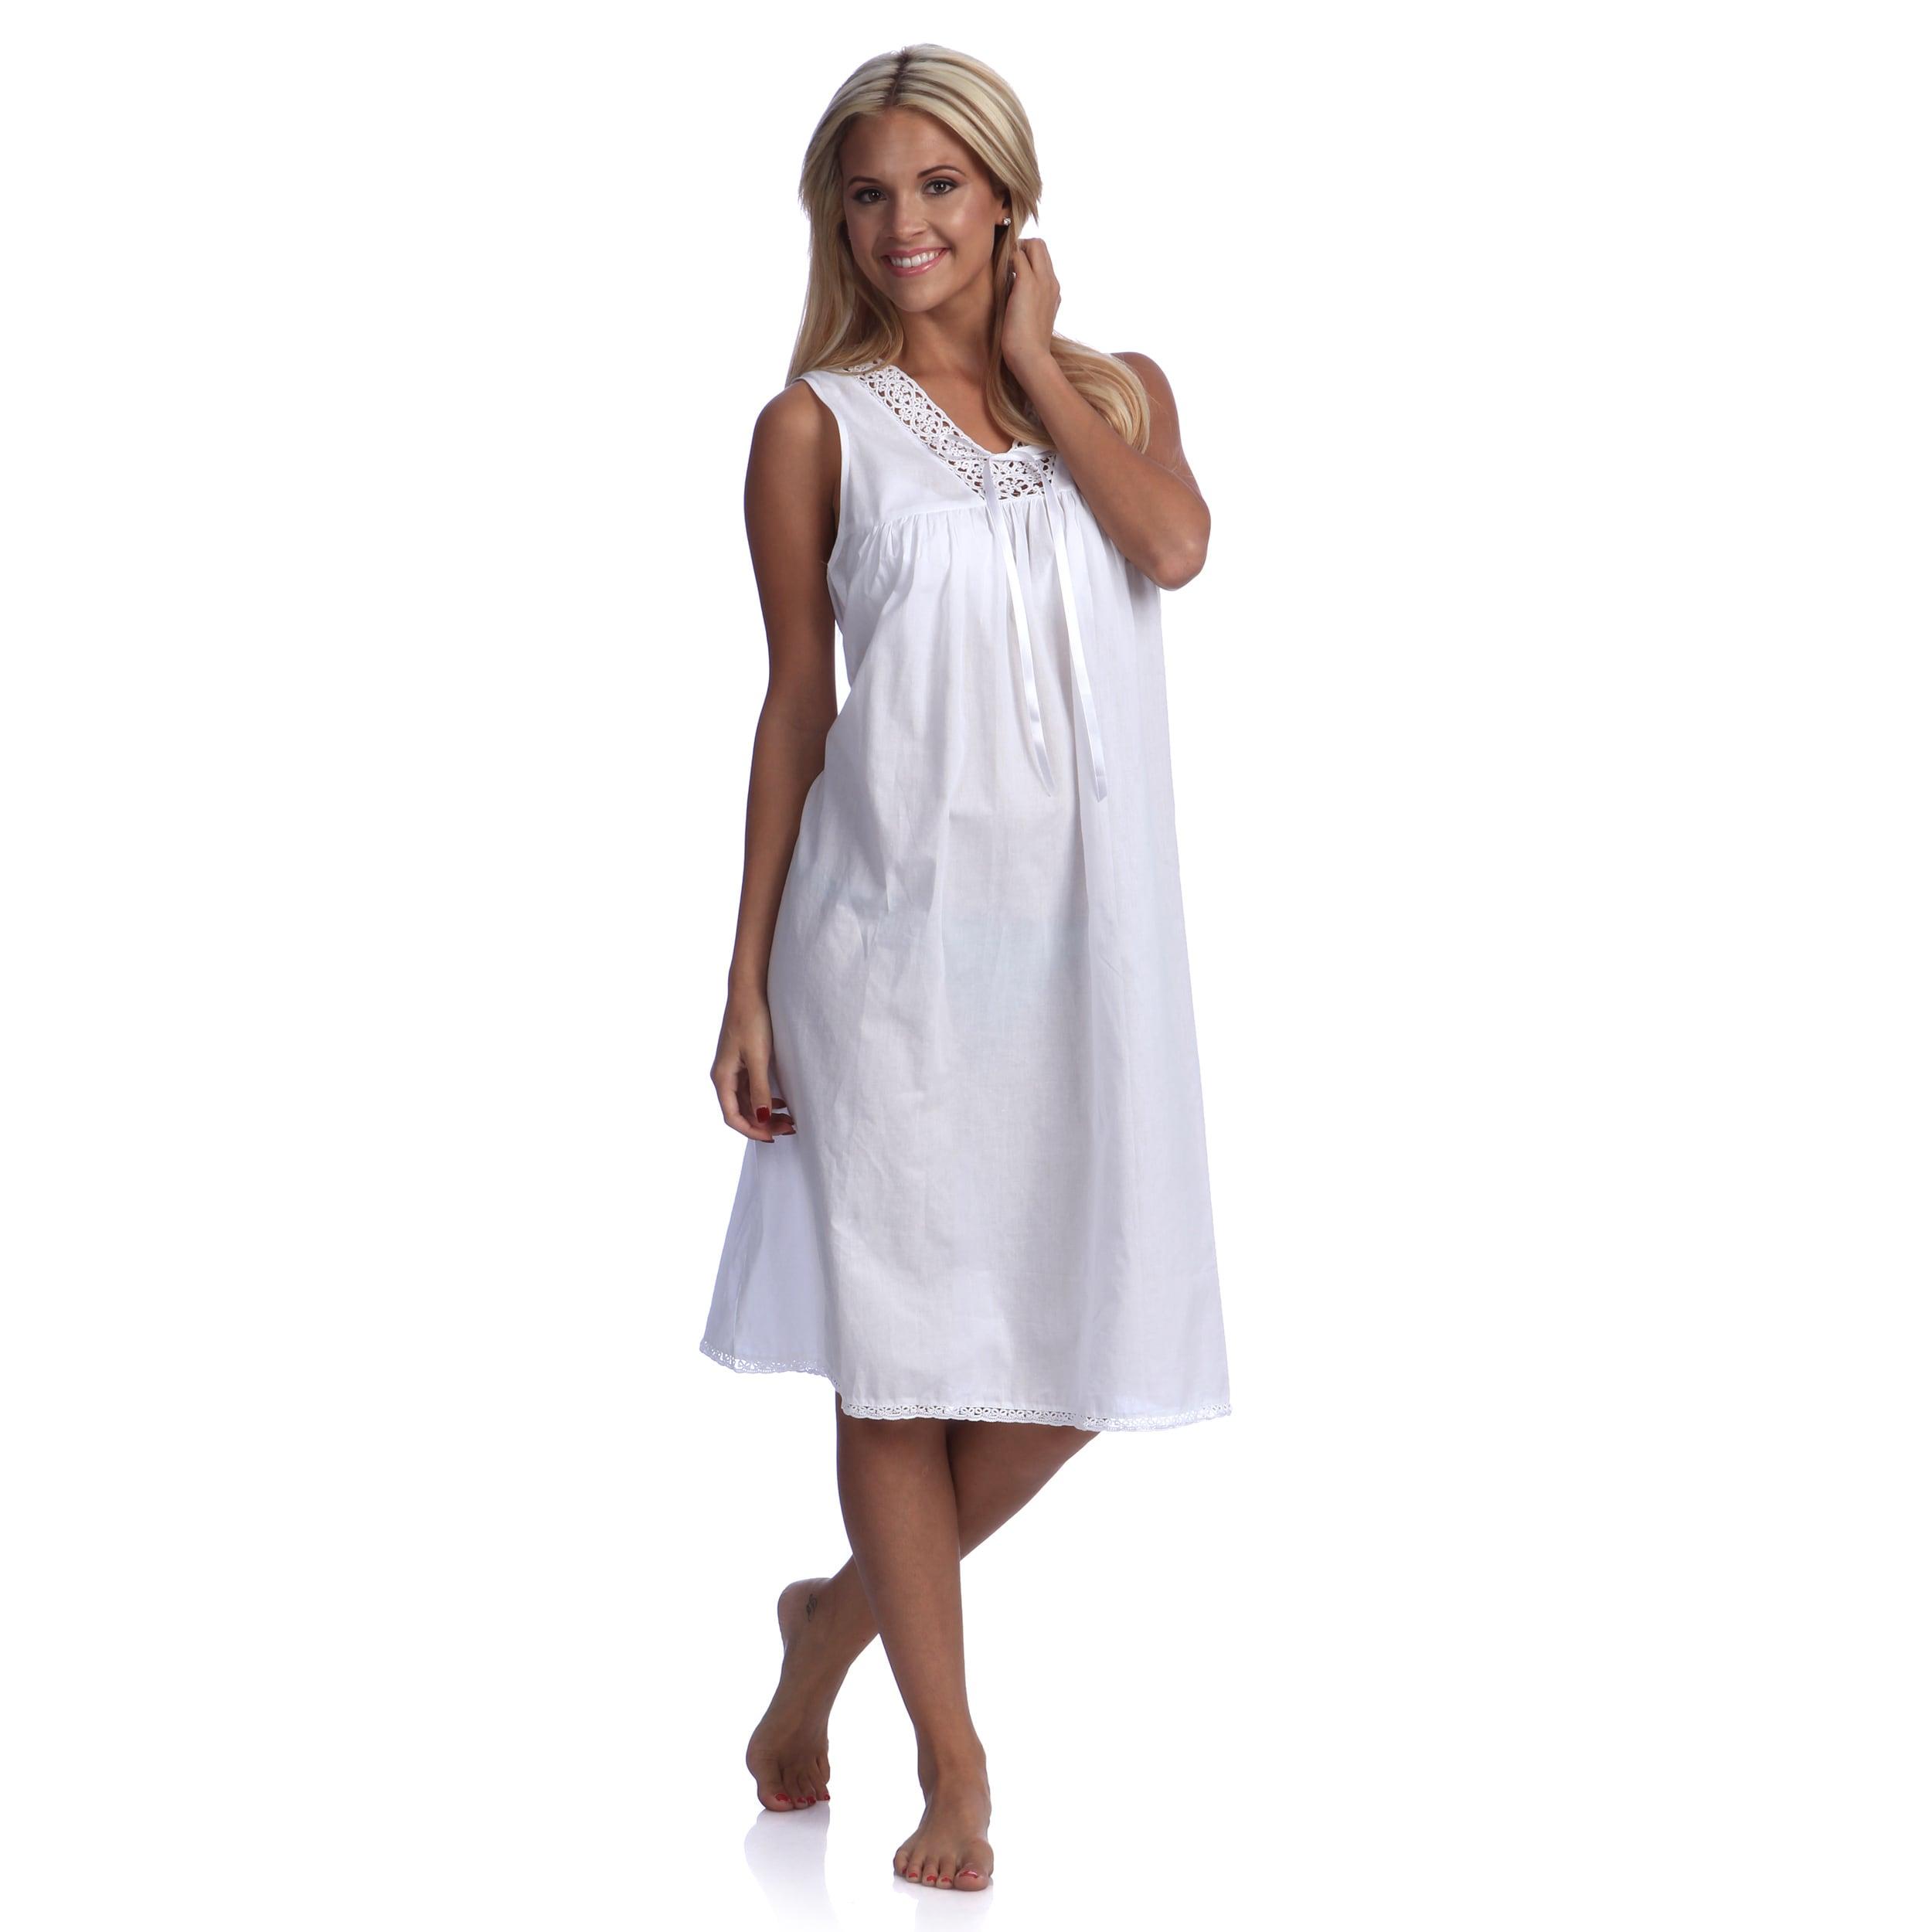 Saro White Tatting Lace Nightgown (L), Women's